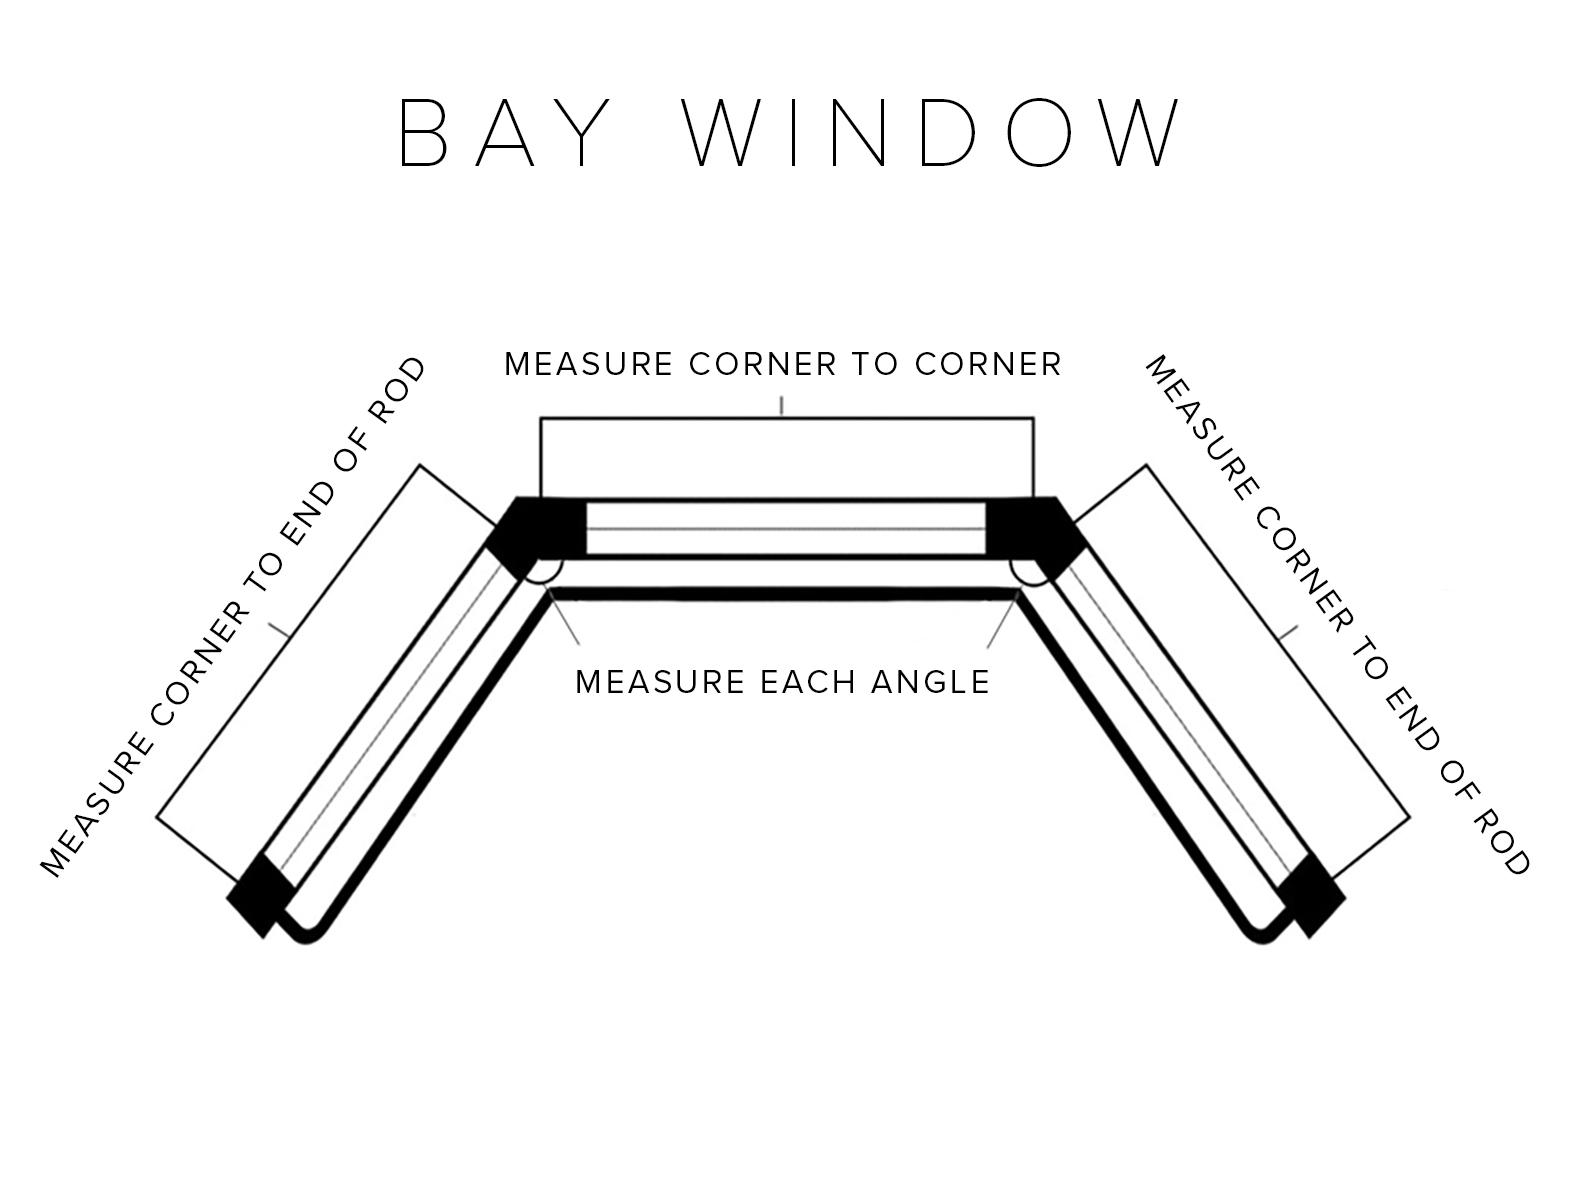 BAYWINDOW.jpg